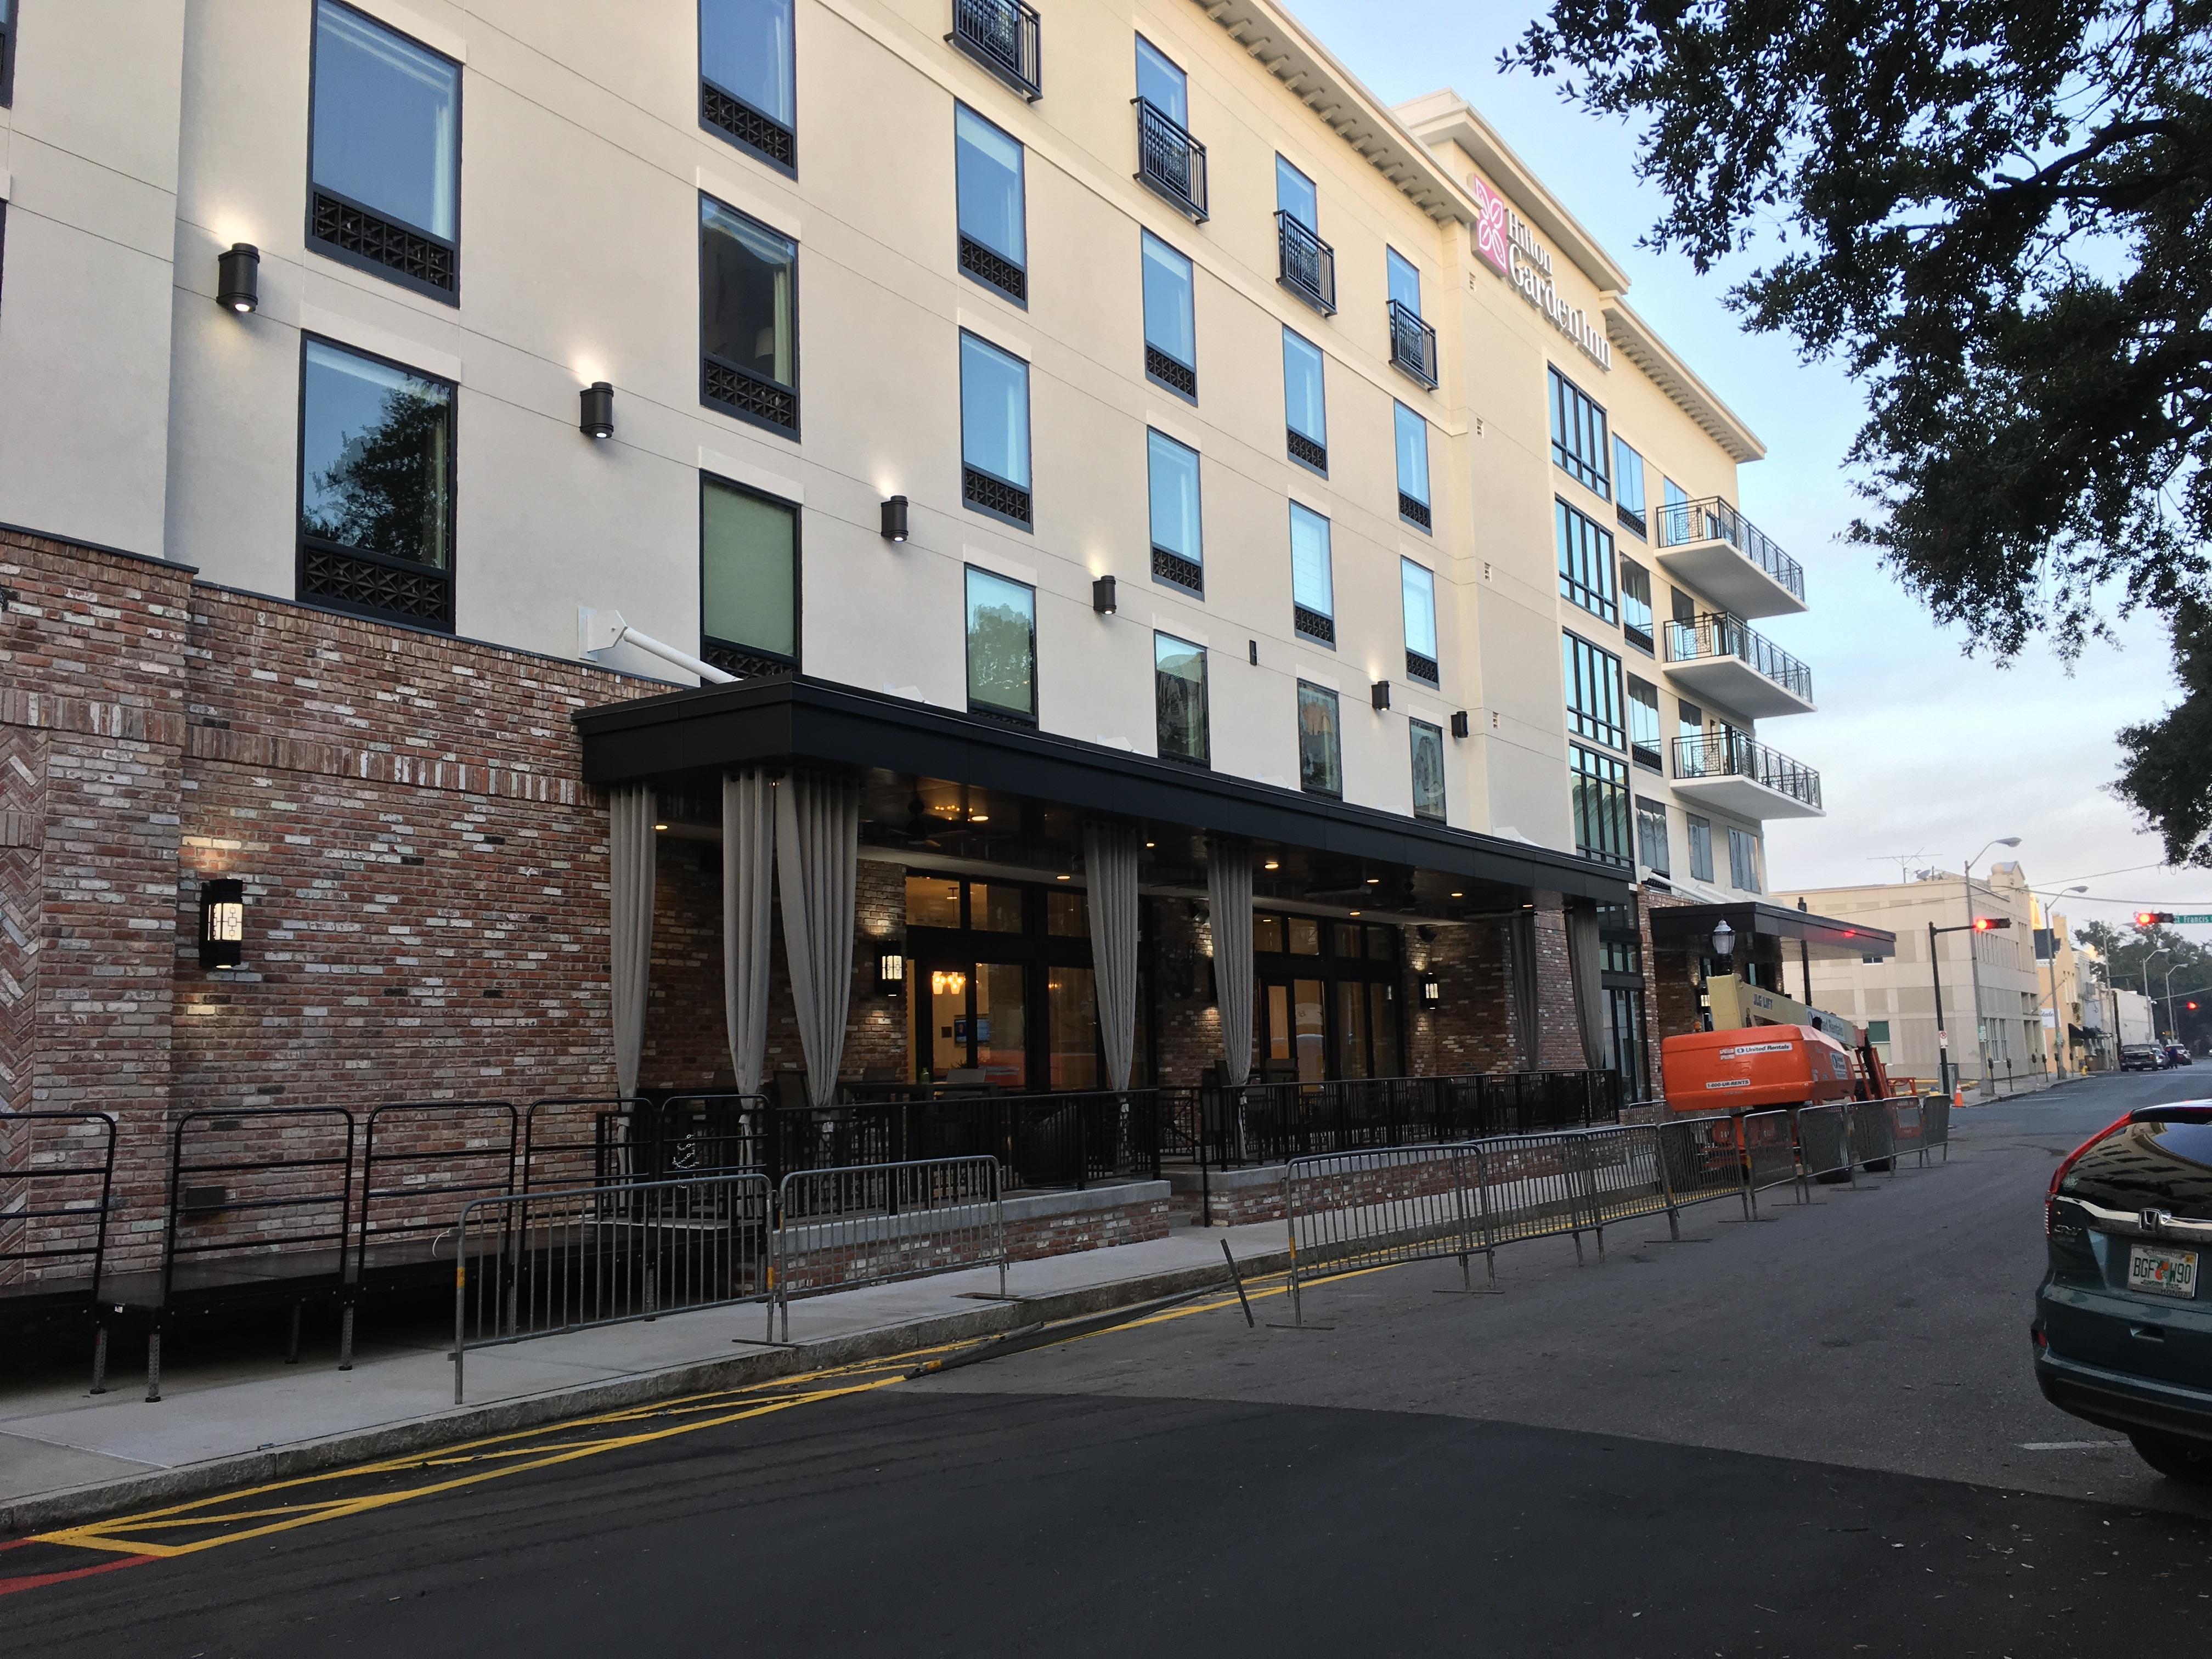 Hilton Garden Inn Mobile Al March 2017 Mcmurry Construction Company Inc